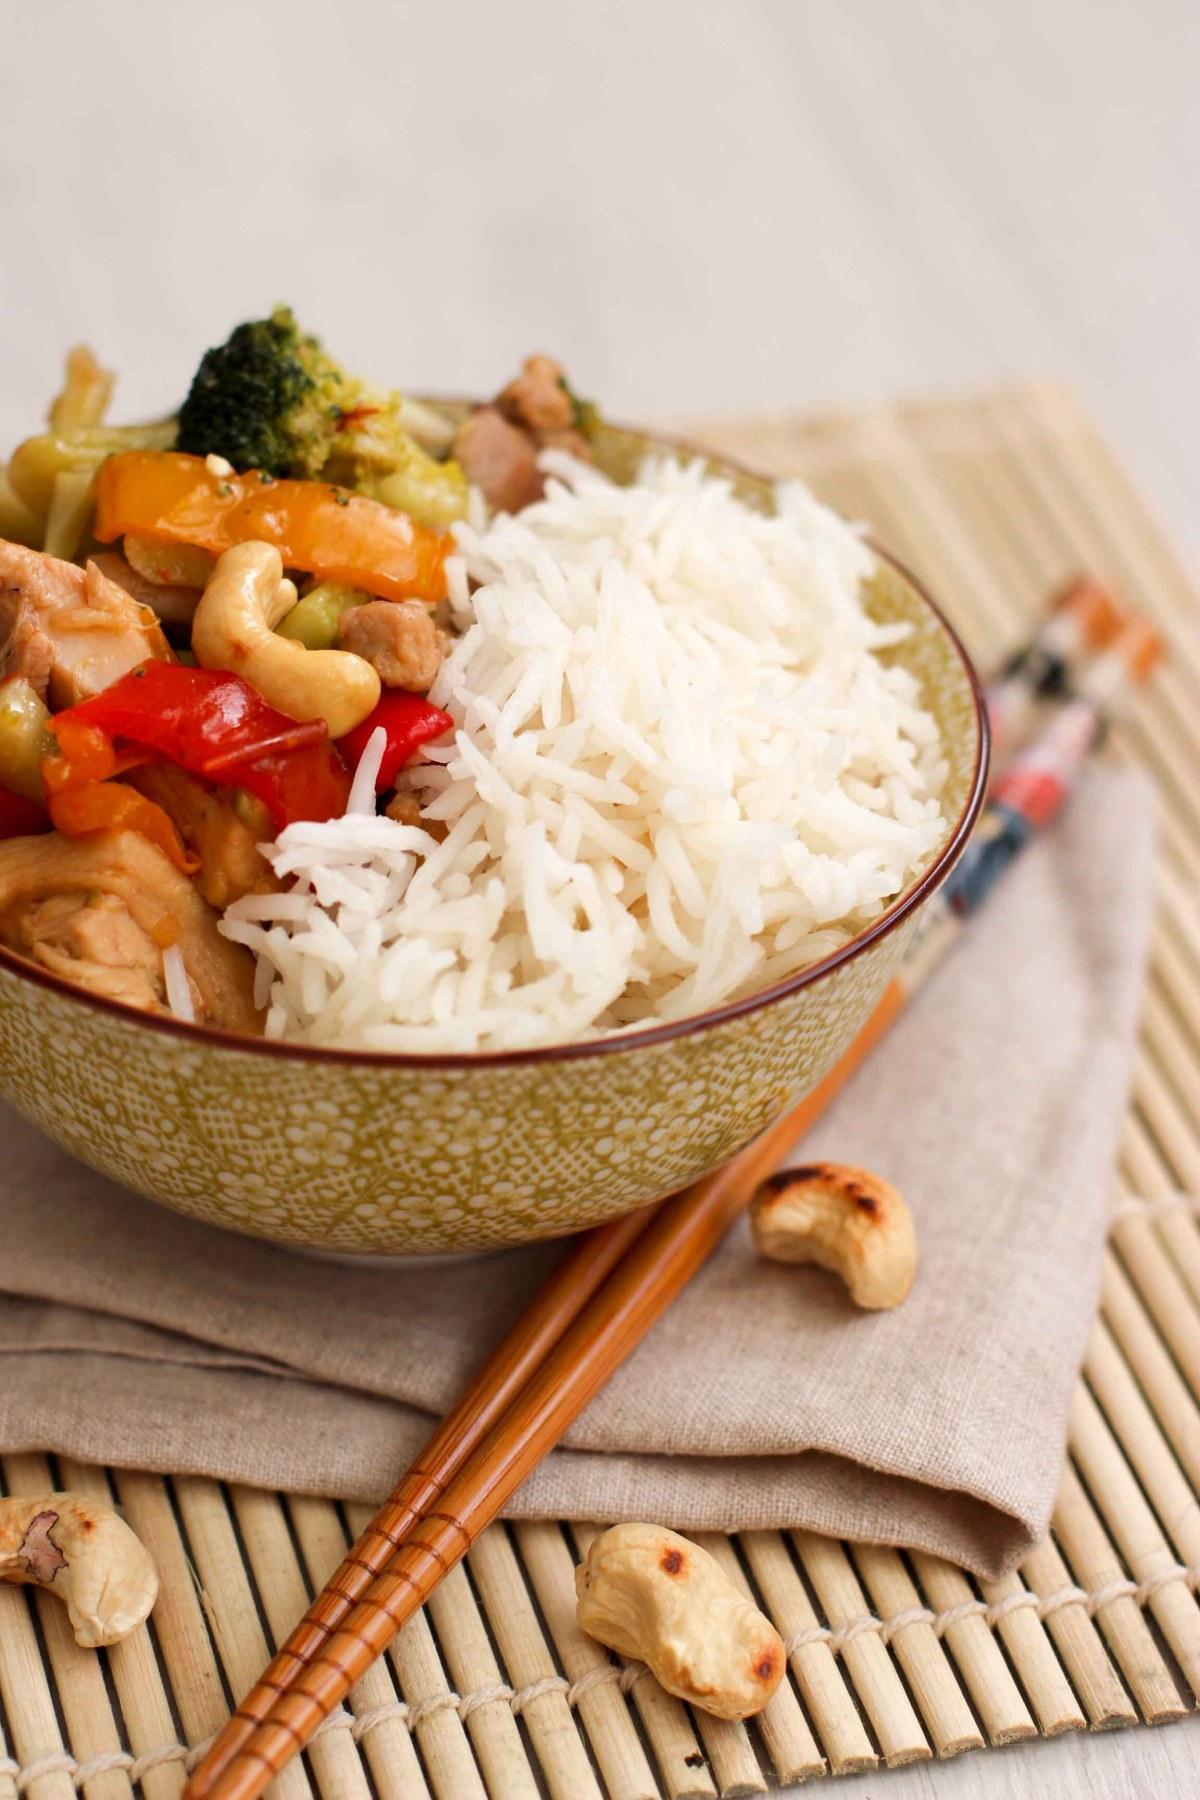 kip-cashew-rijst-zoet-zuur-gezond-2